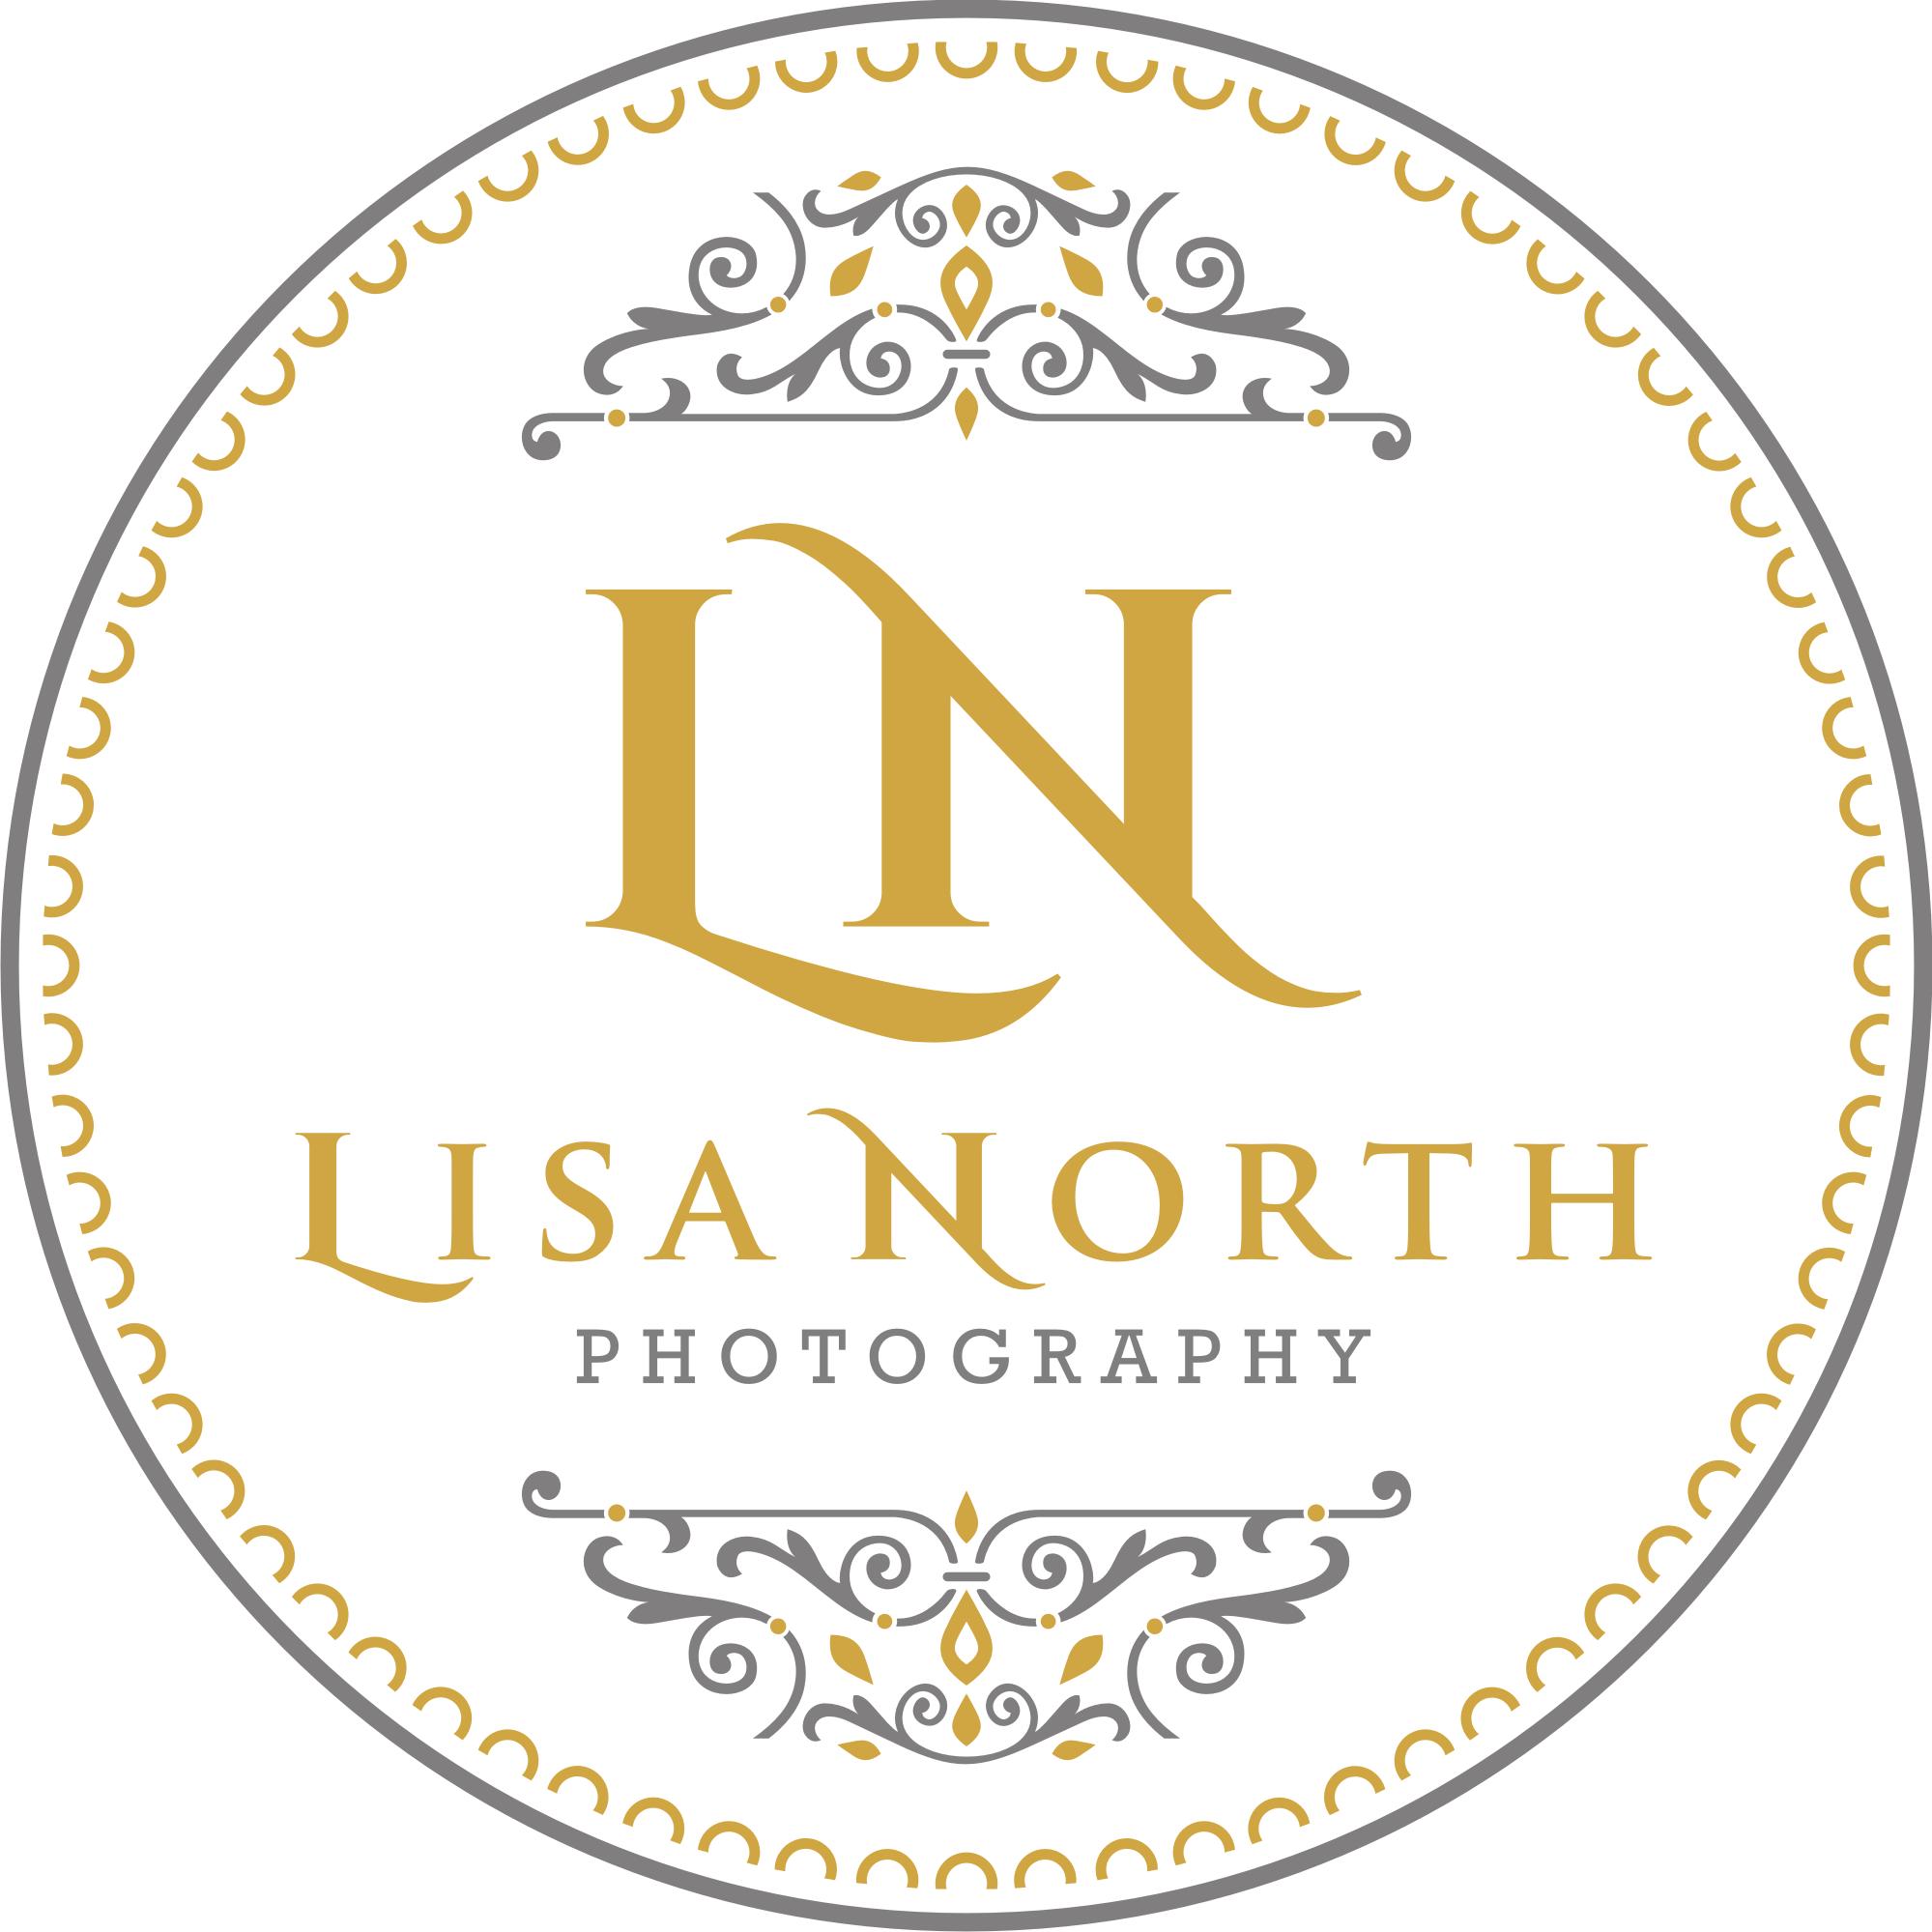 Lisa North Photography